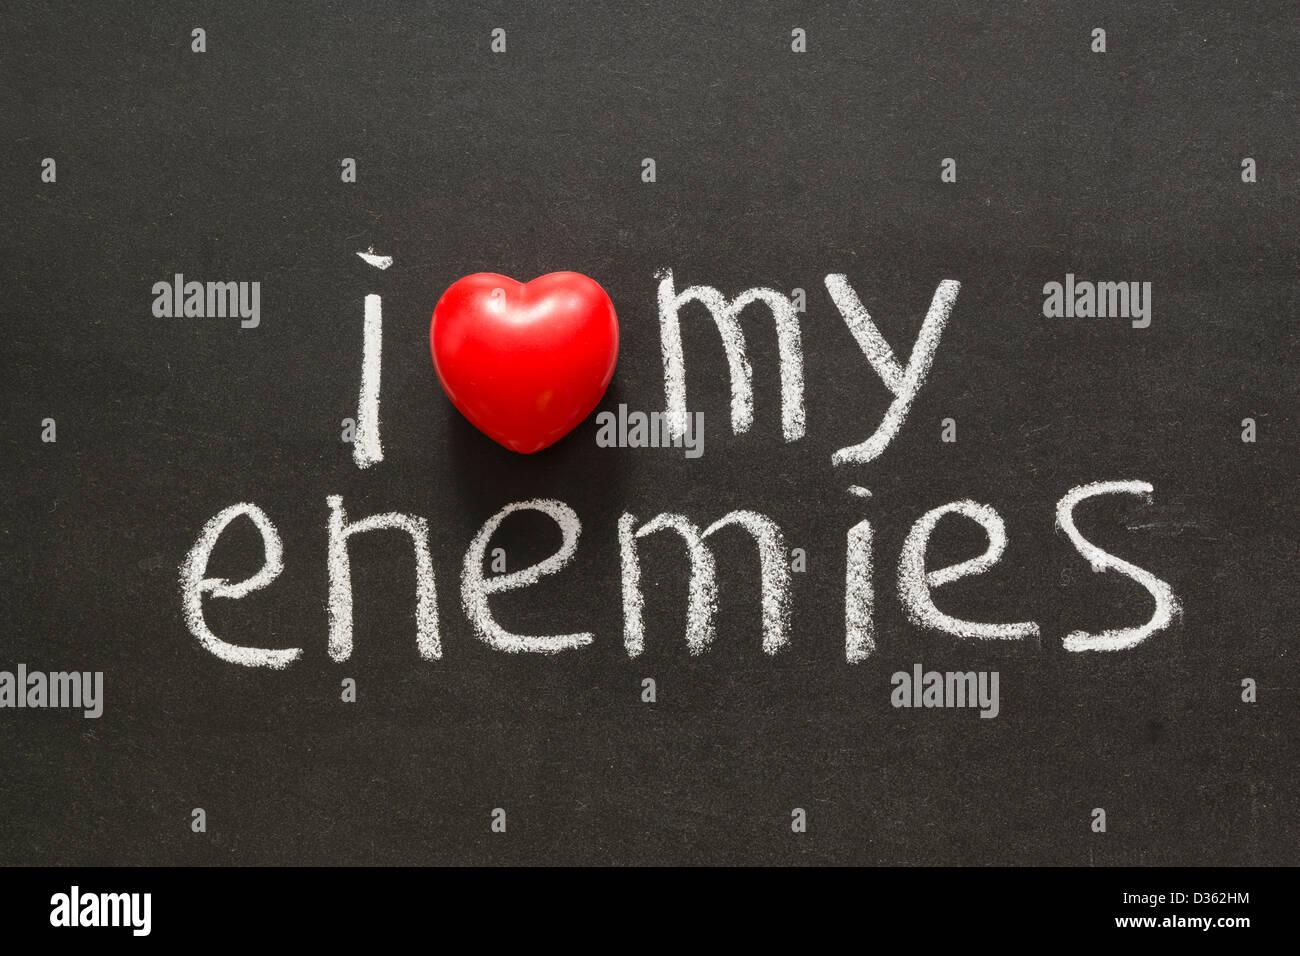 I love my enemies phrase handwritten on blackboard - Stock Image